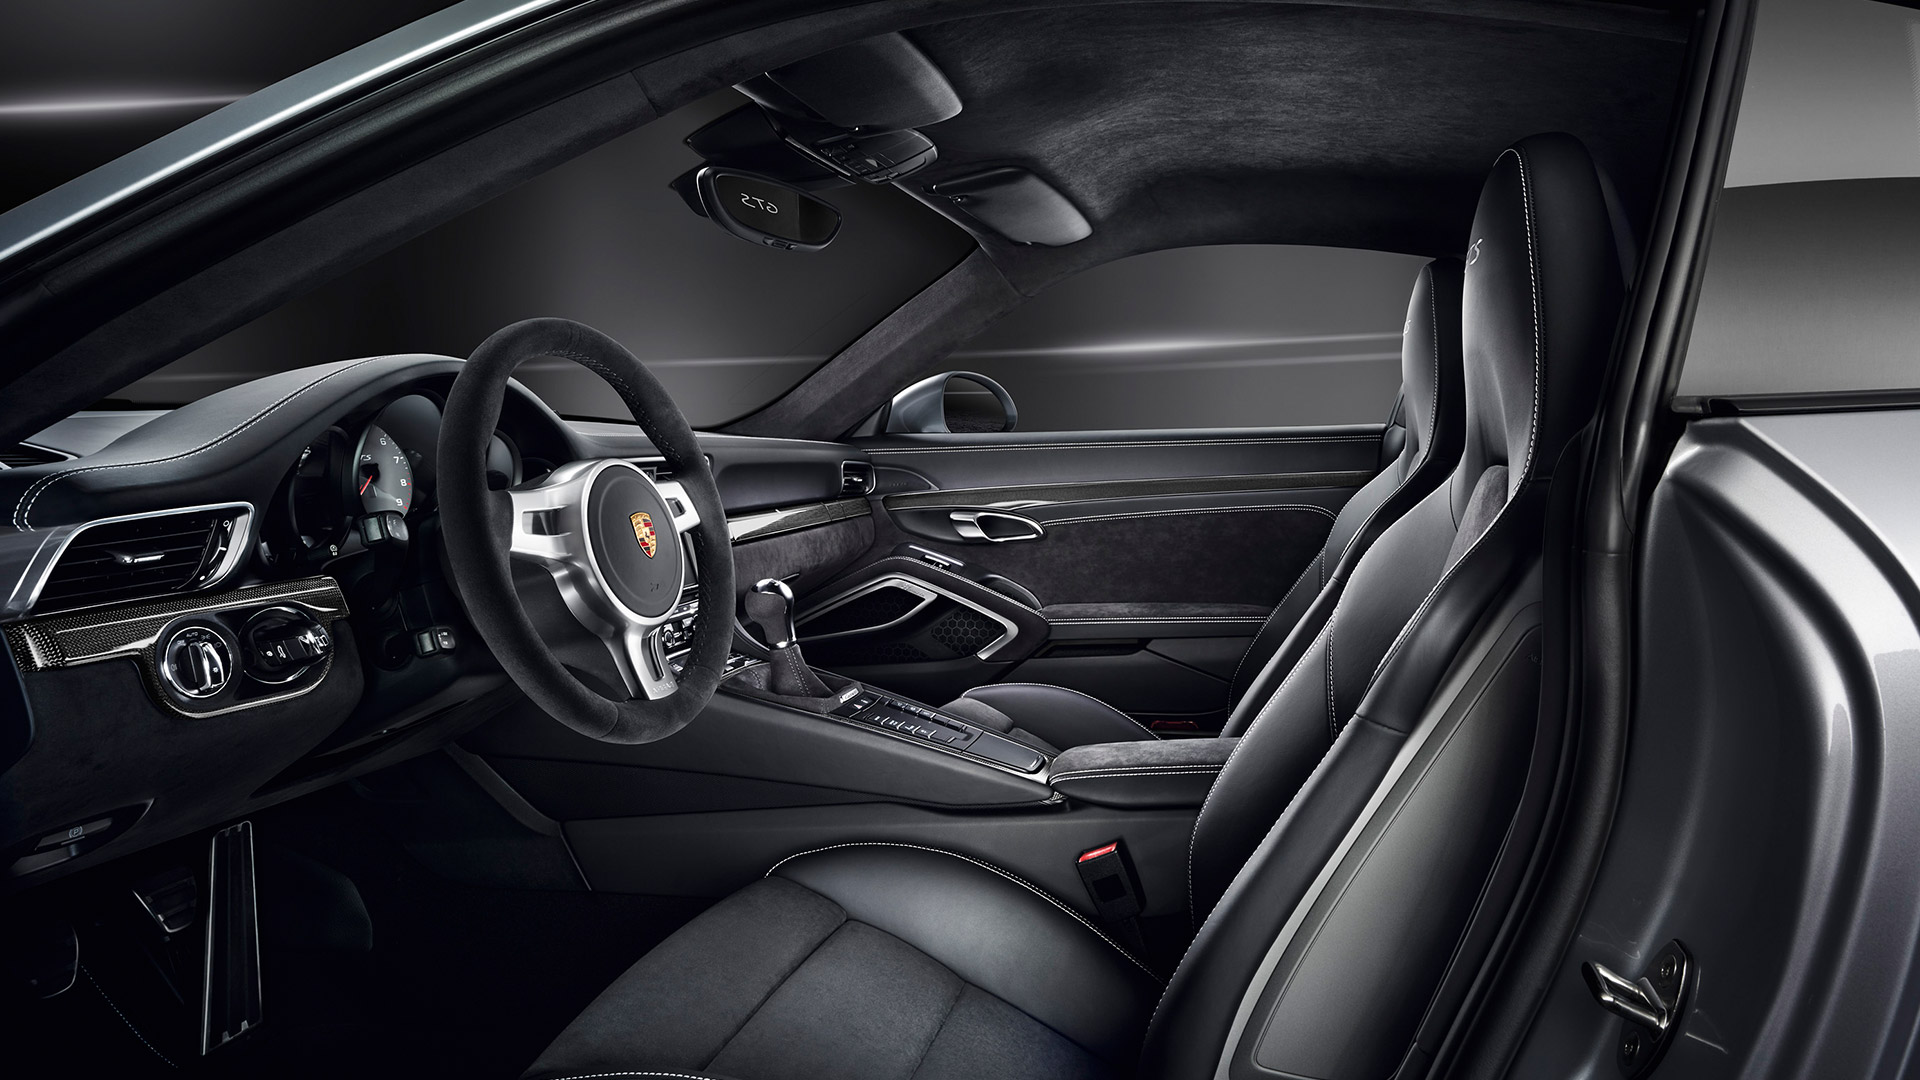 Porsche 911 2015 Carrera 4 GTS Interior